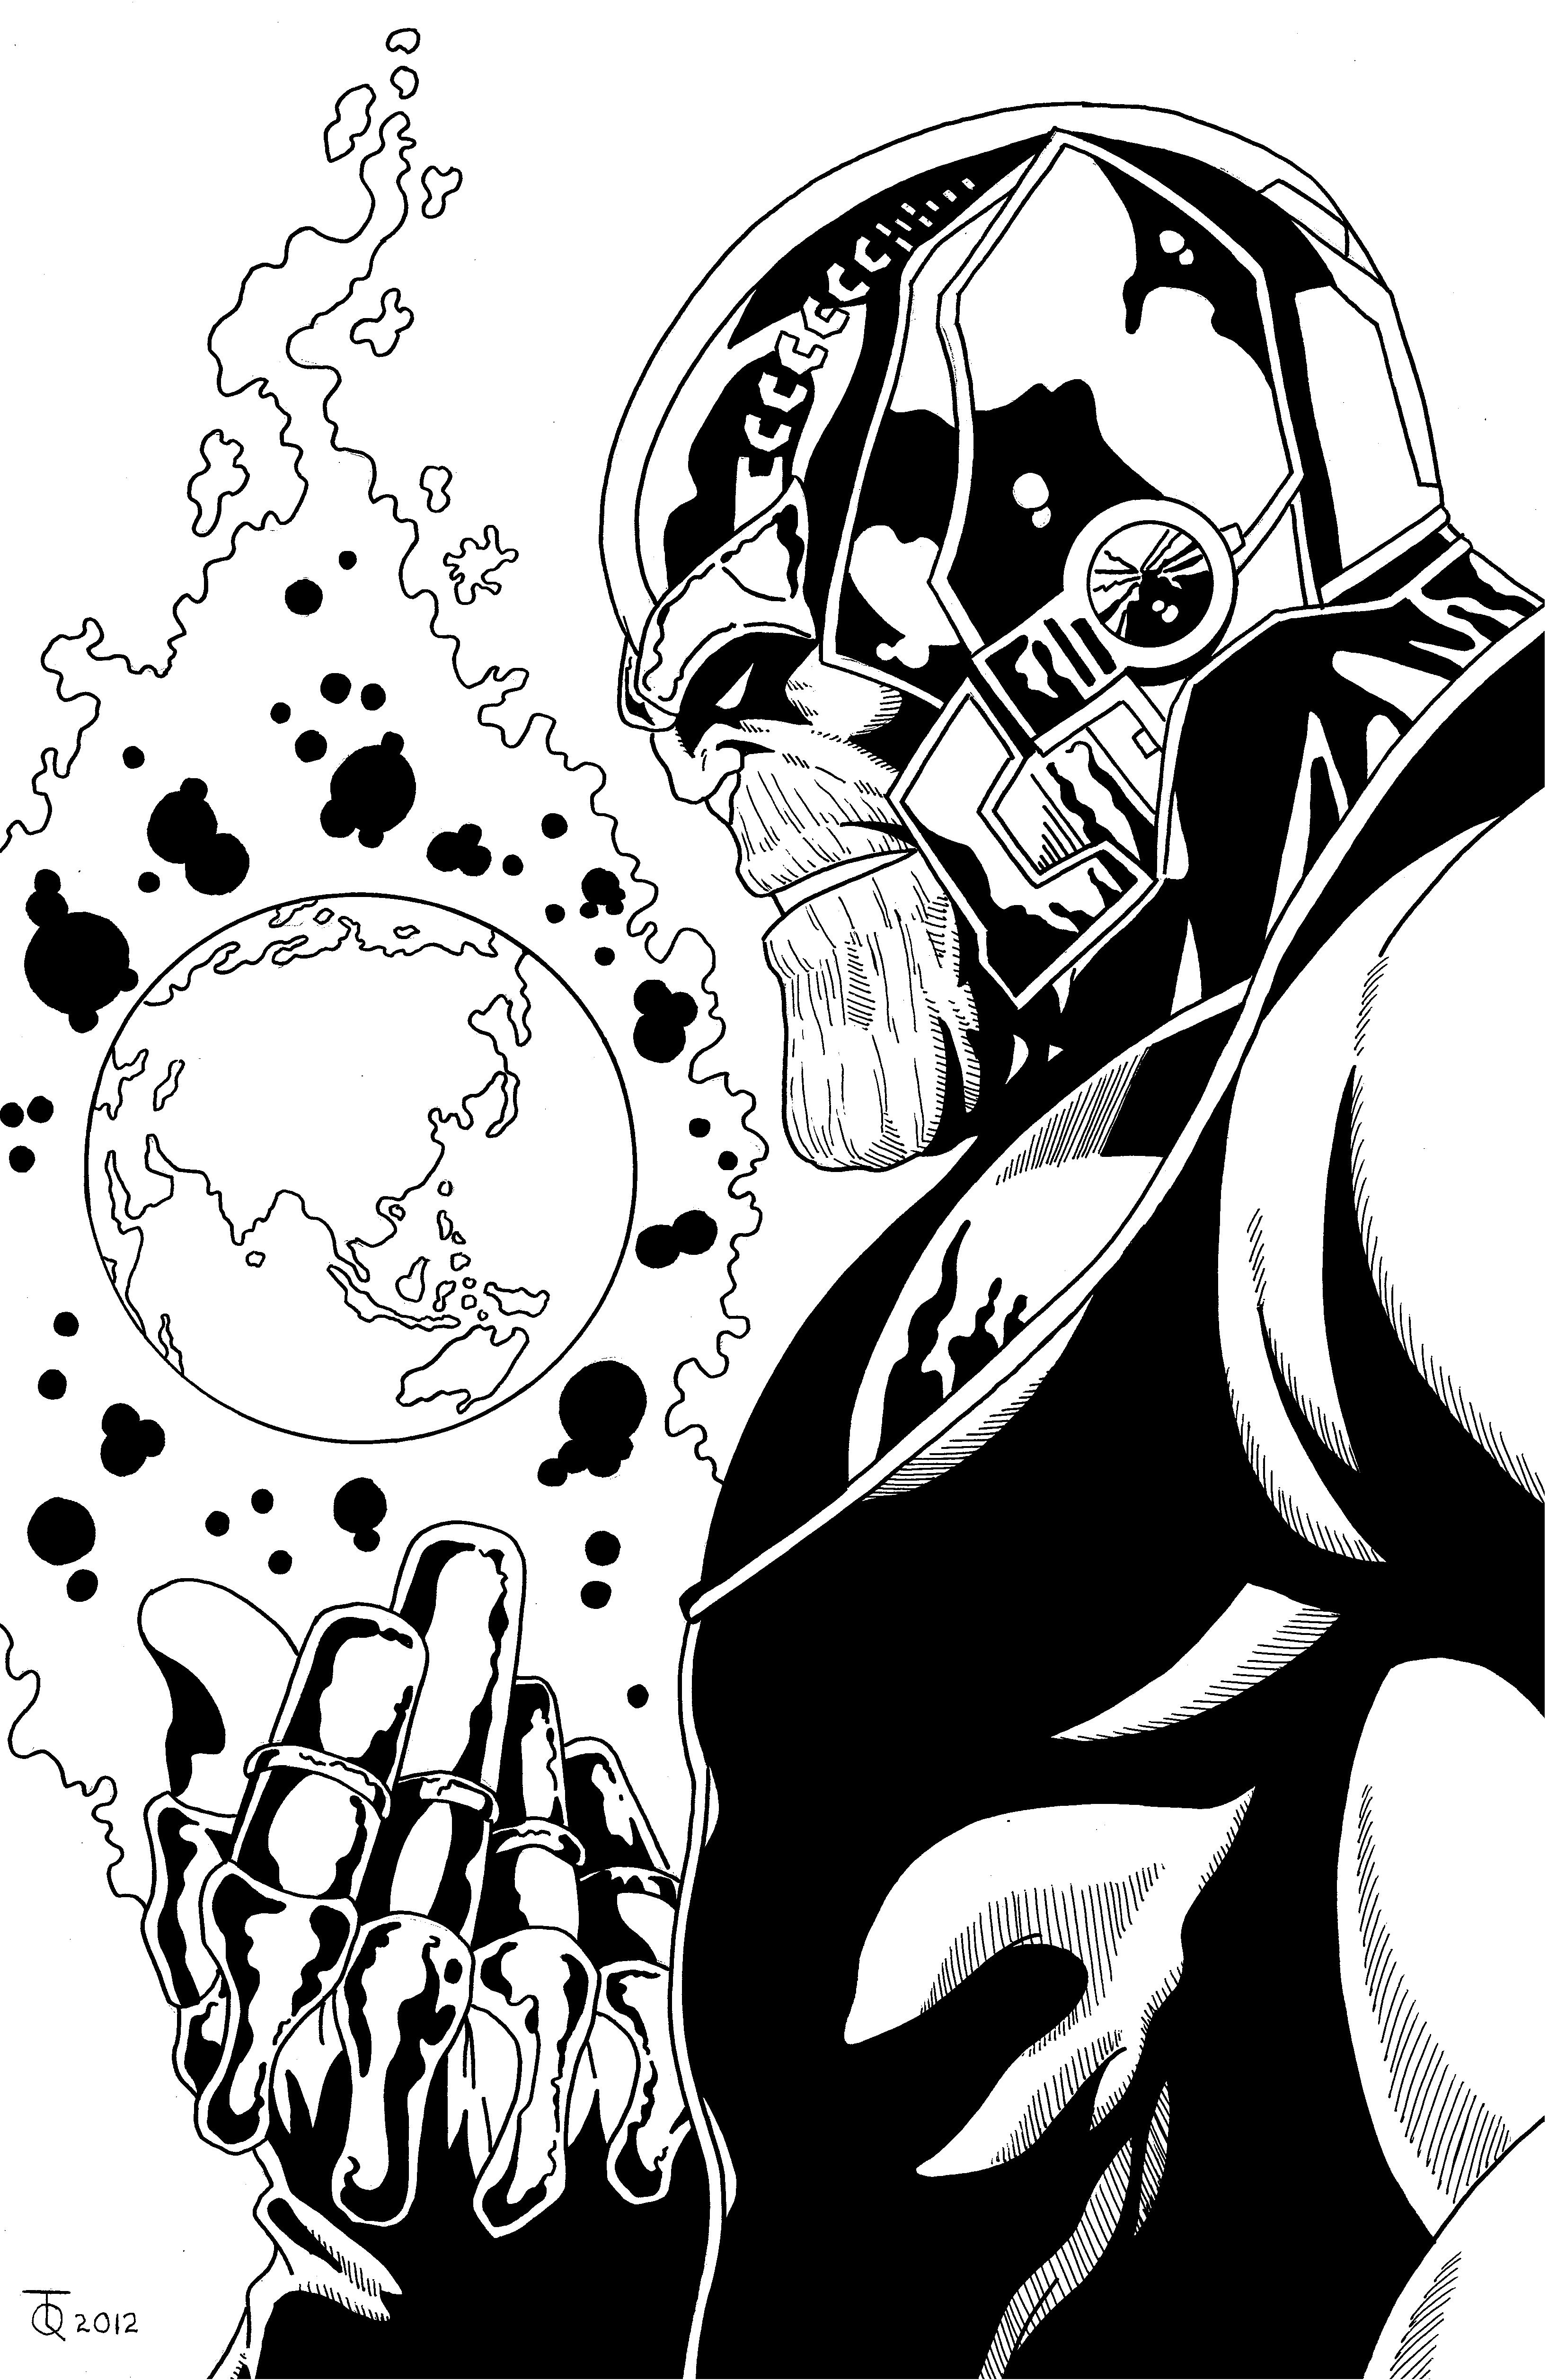 Képek - Page 4 Thanos_the_dark_titan_inked_by_tyndallsquest-d5lqqqs